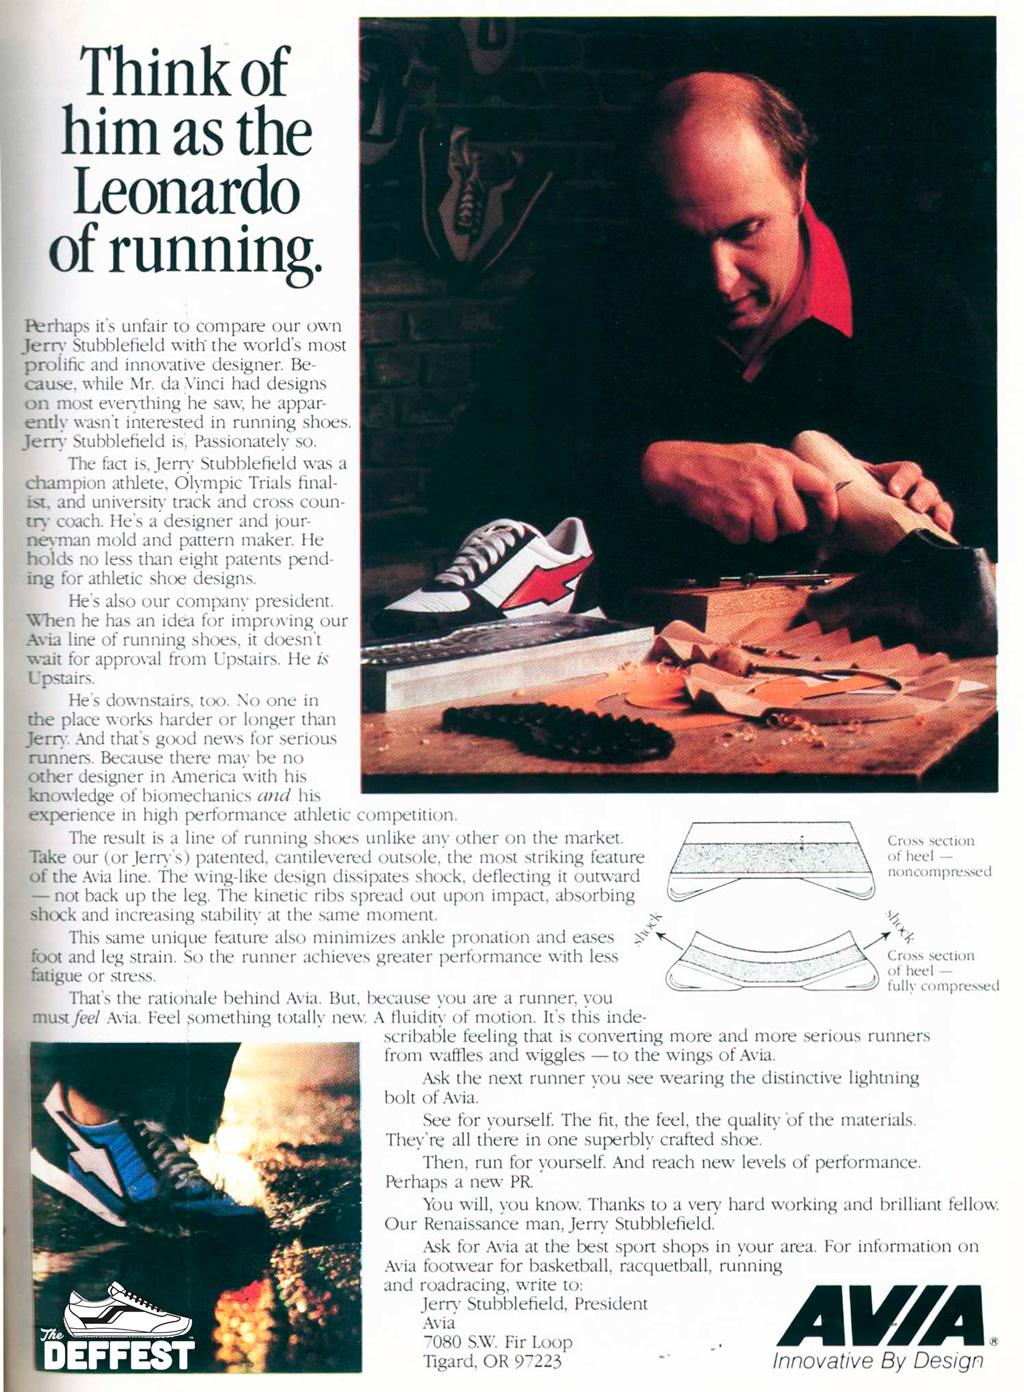 Бренд Avia кроссовки конкуренты Nike в 80х